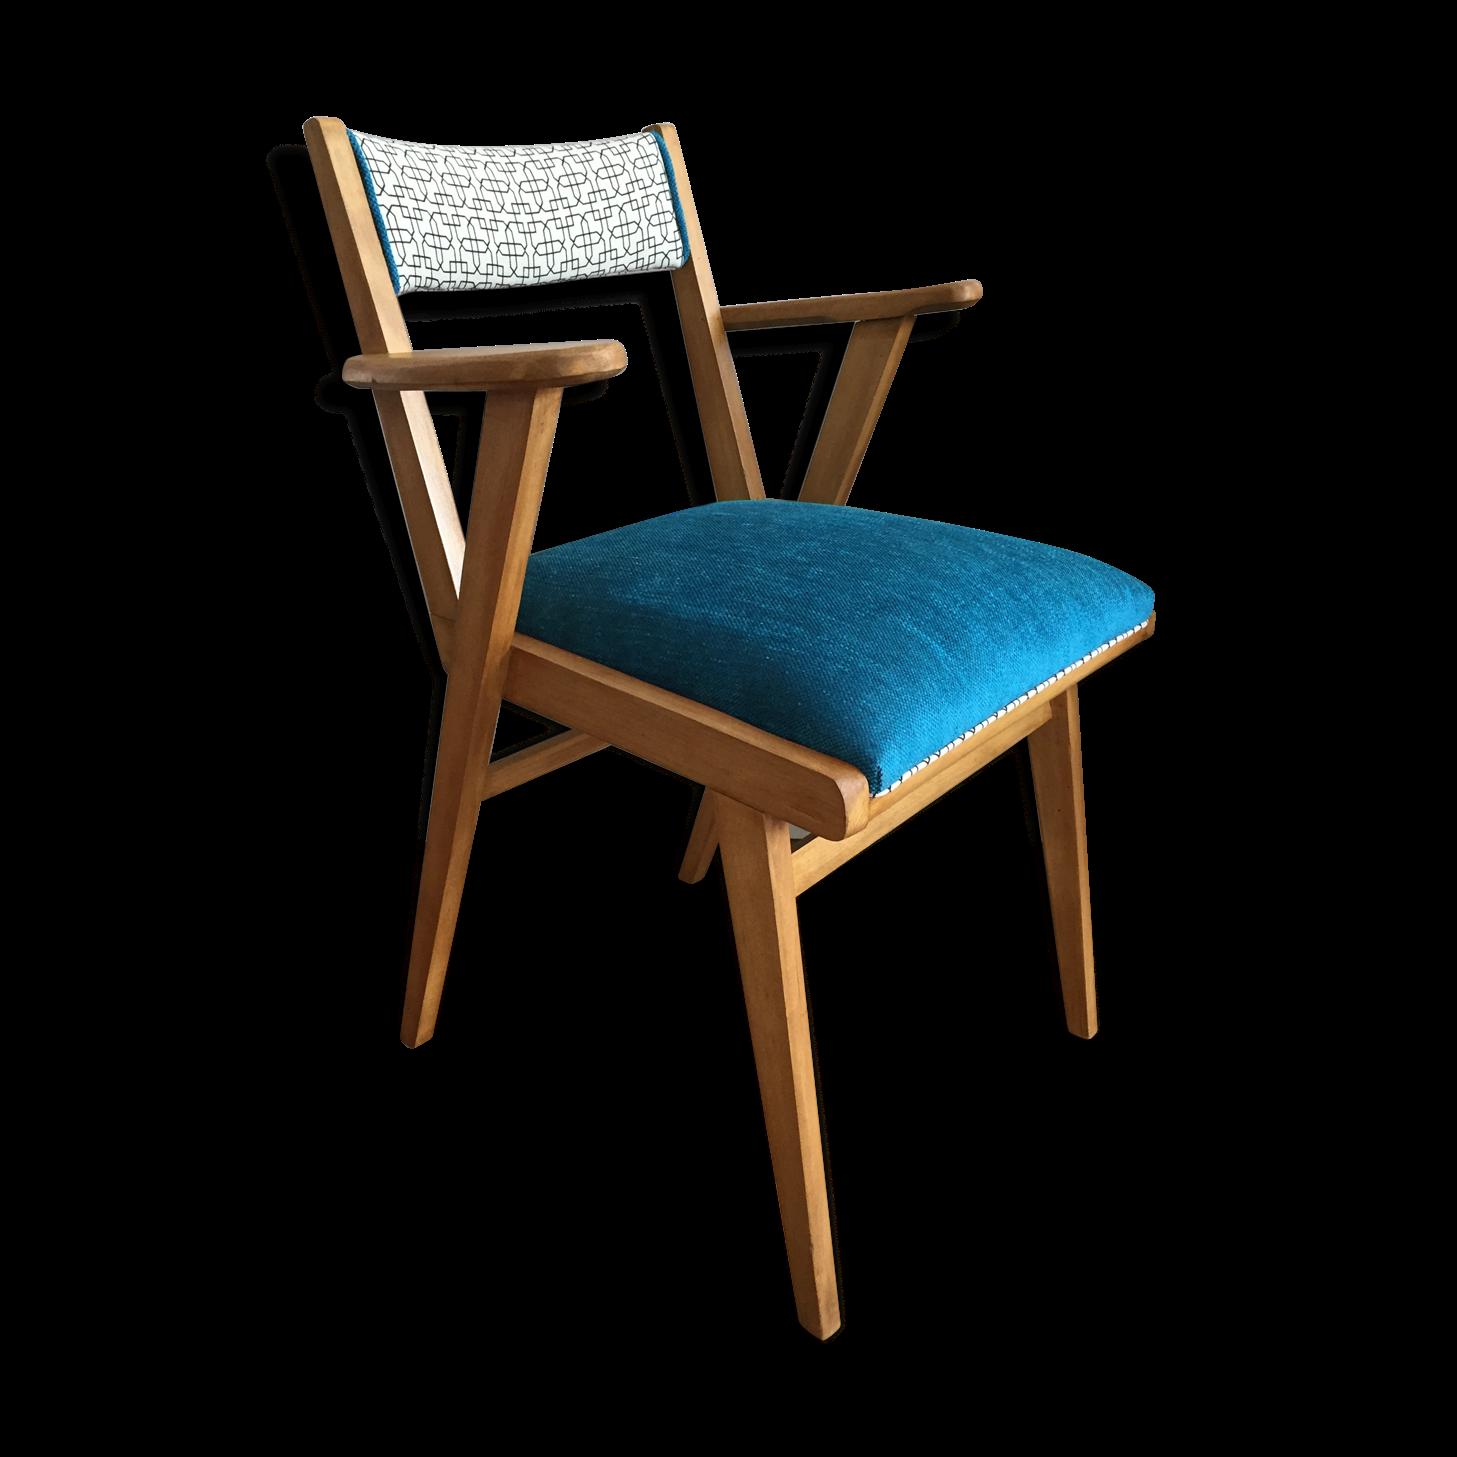 pied scandinave bahut scandinave beton pied bois svartan. Black Bedroom Furniture Sets. Home Design Ideas